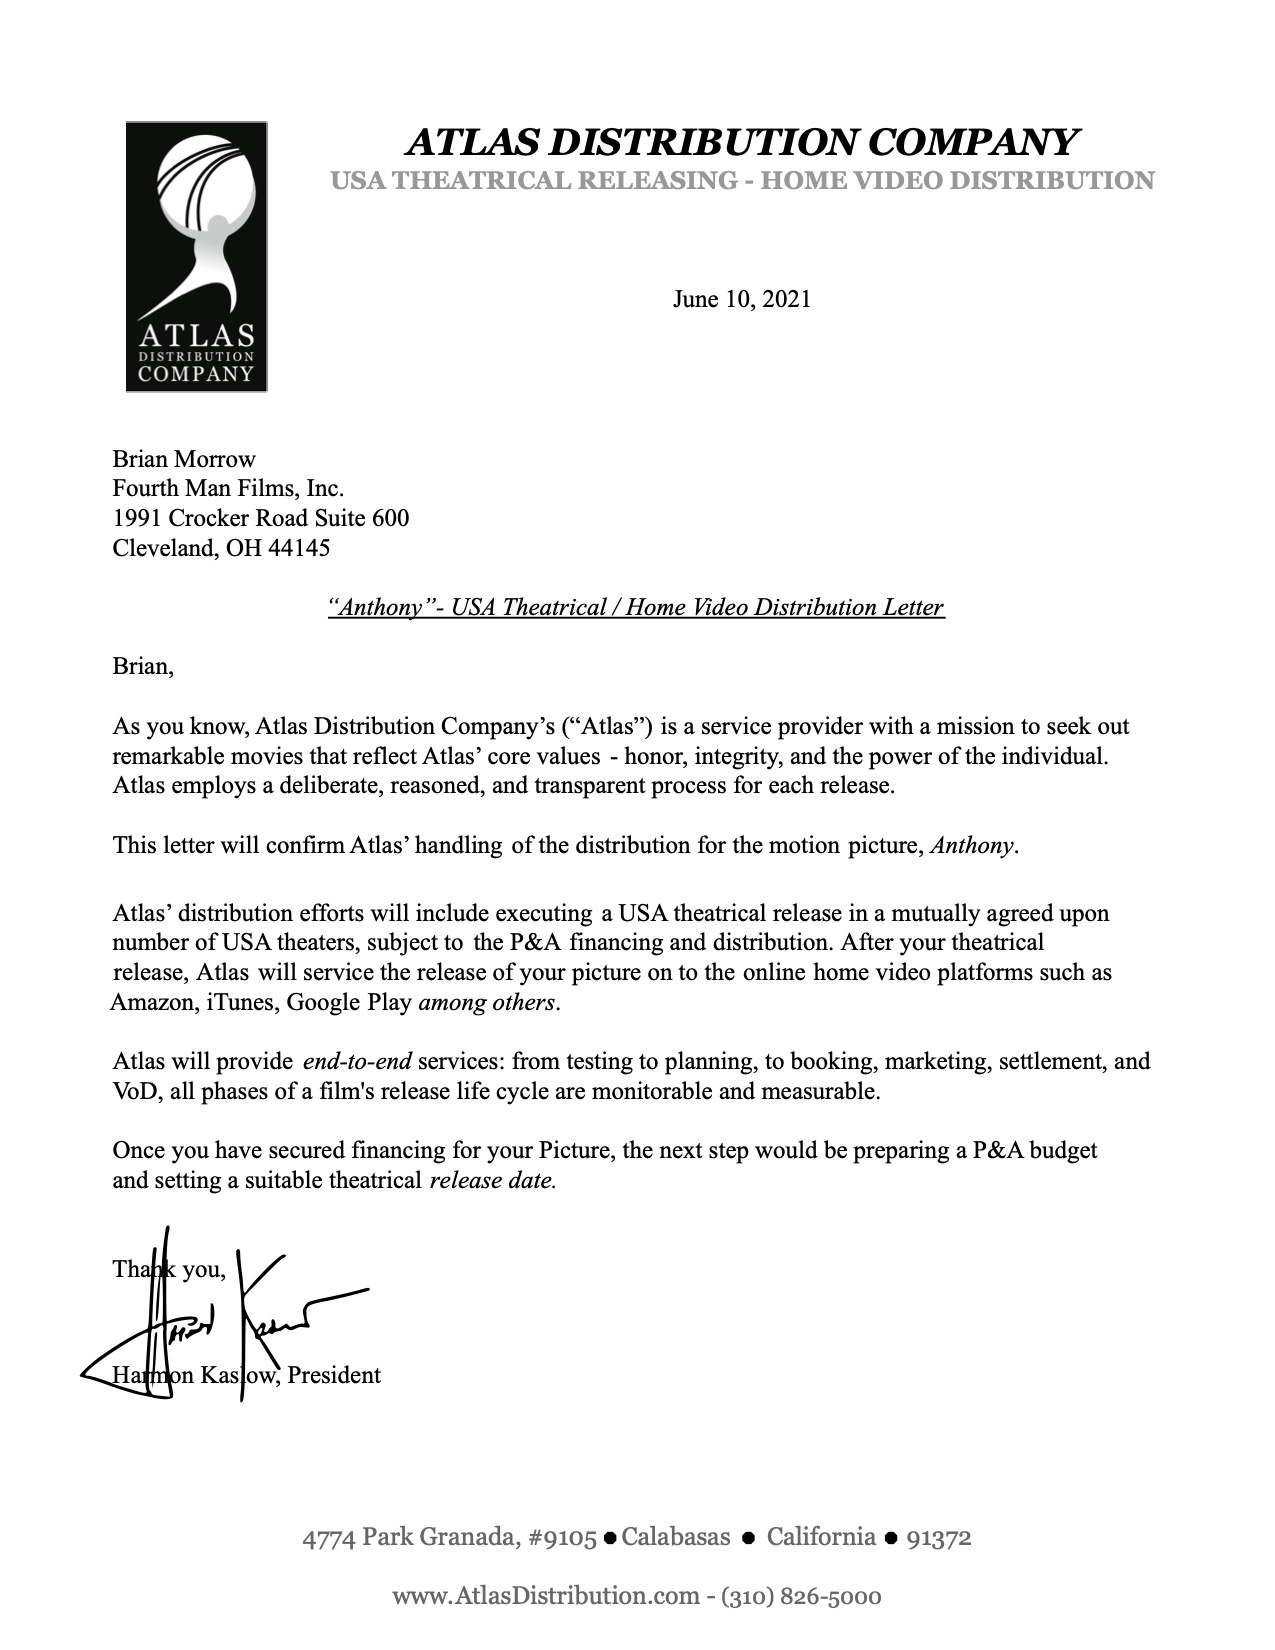 Atlas Distribution Letter